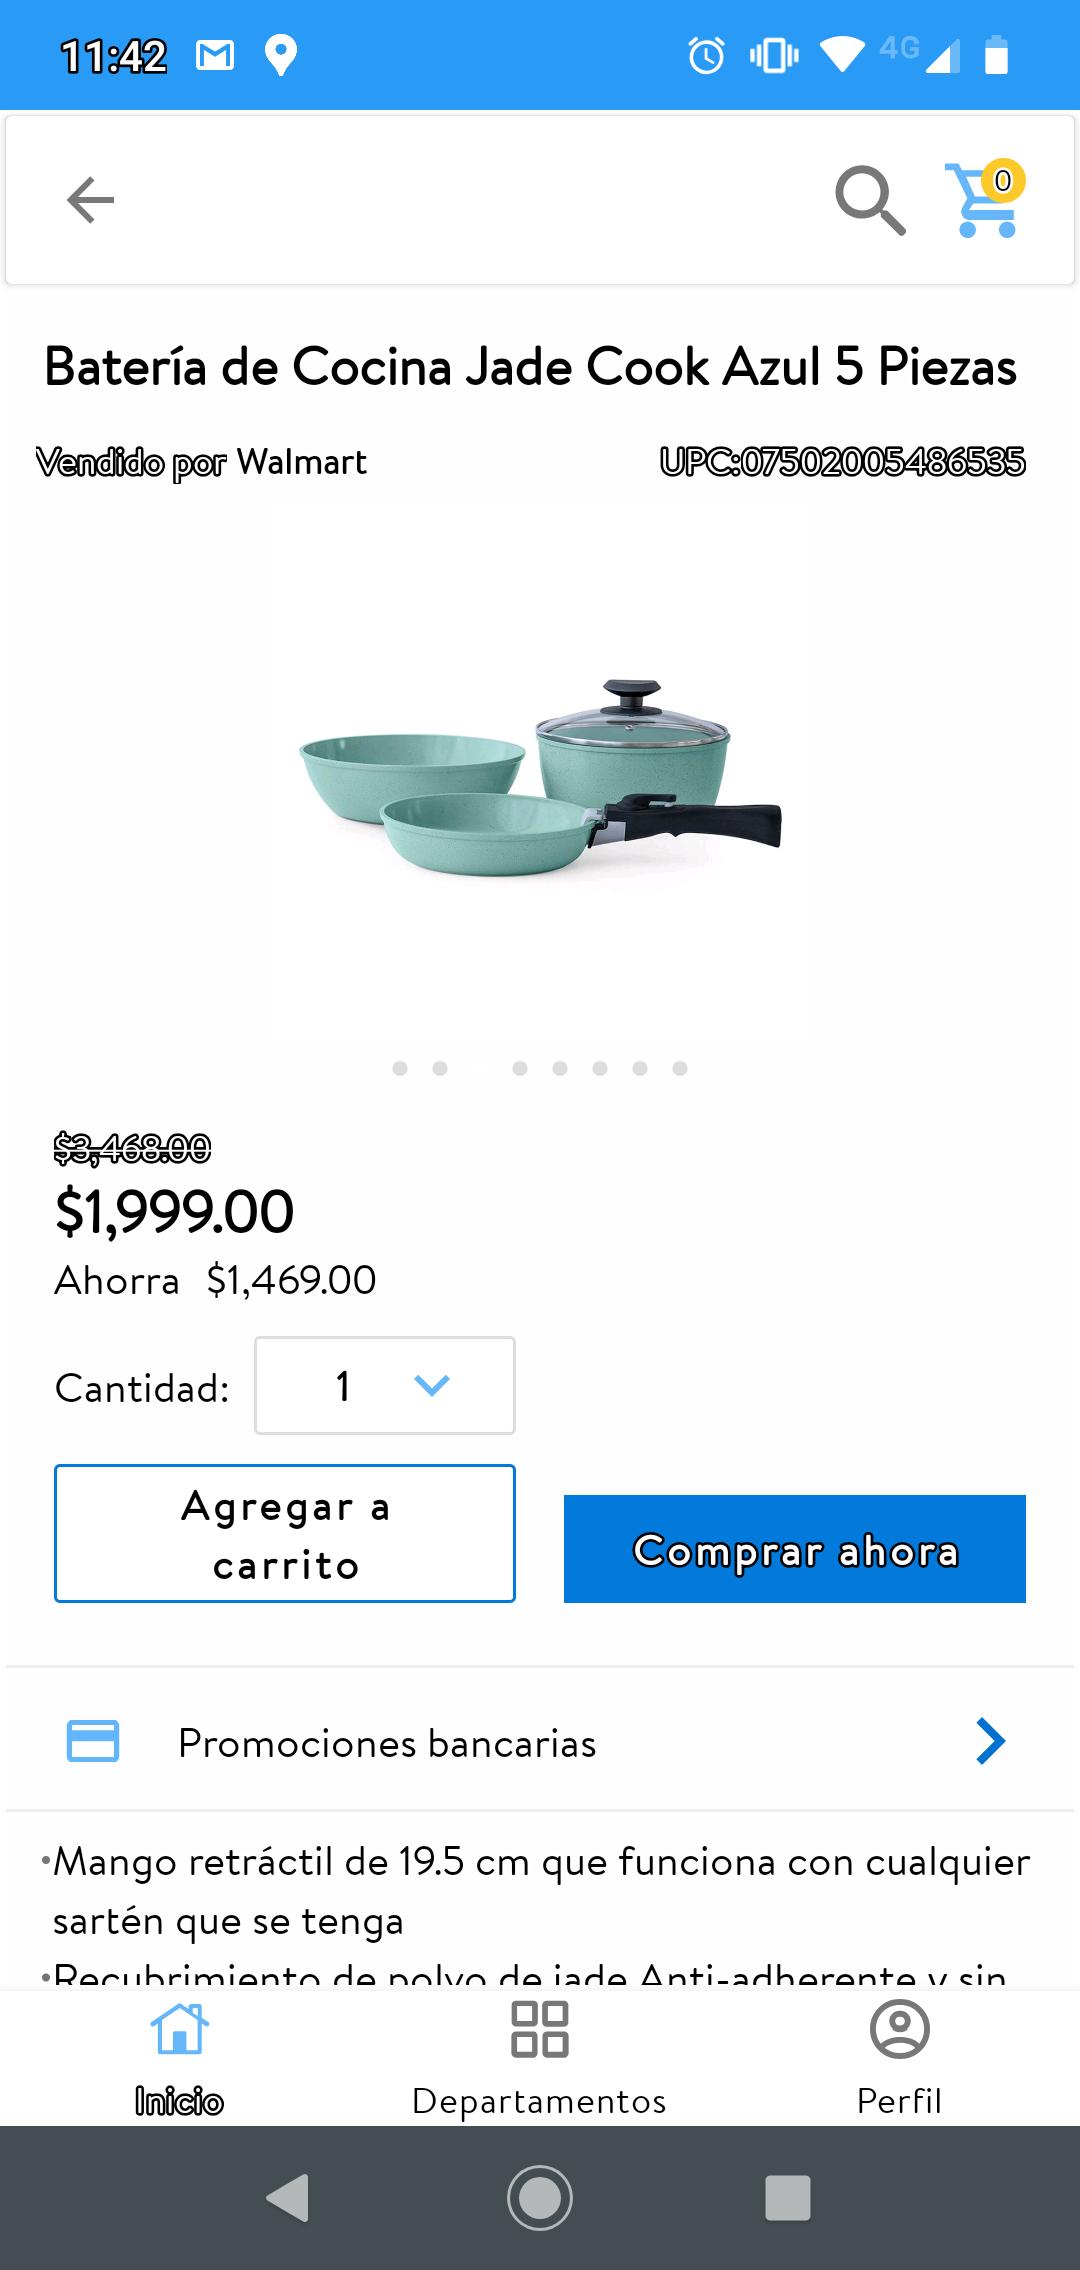 Walmart Batería de Cocina Jade Cook Azul 5 Piezas De $3468 a $1999